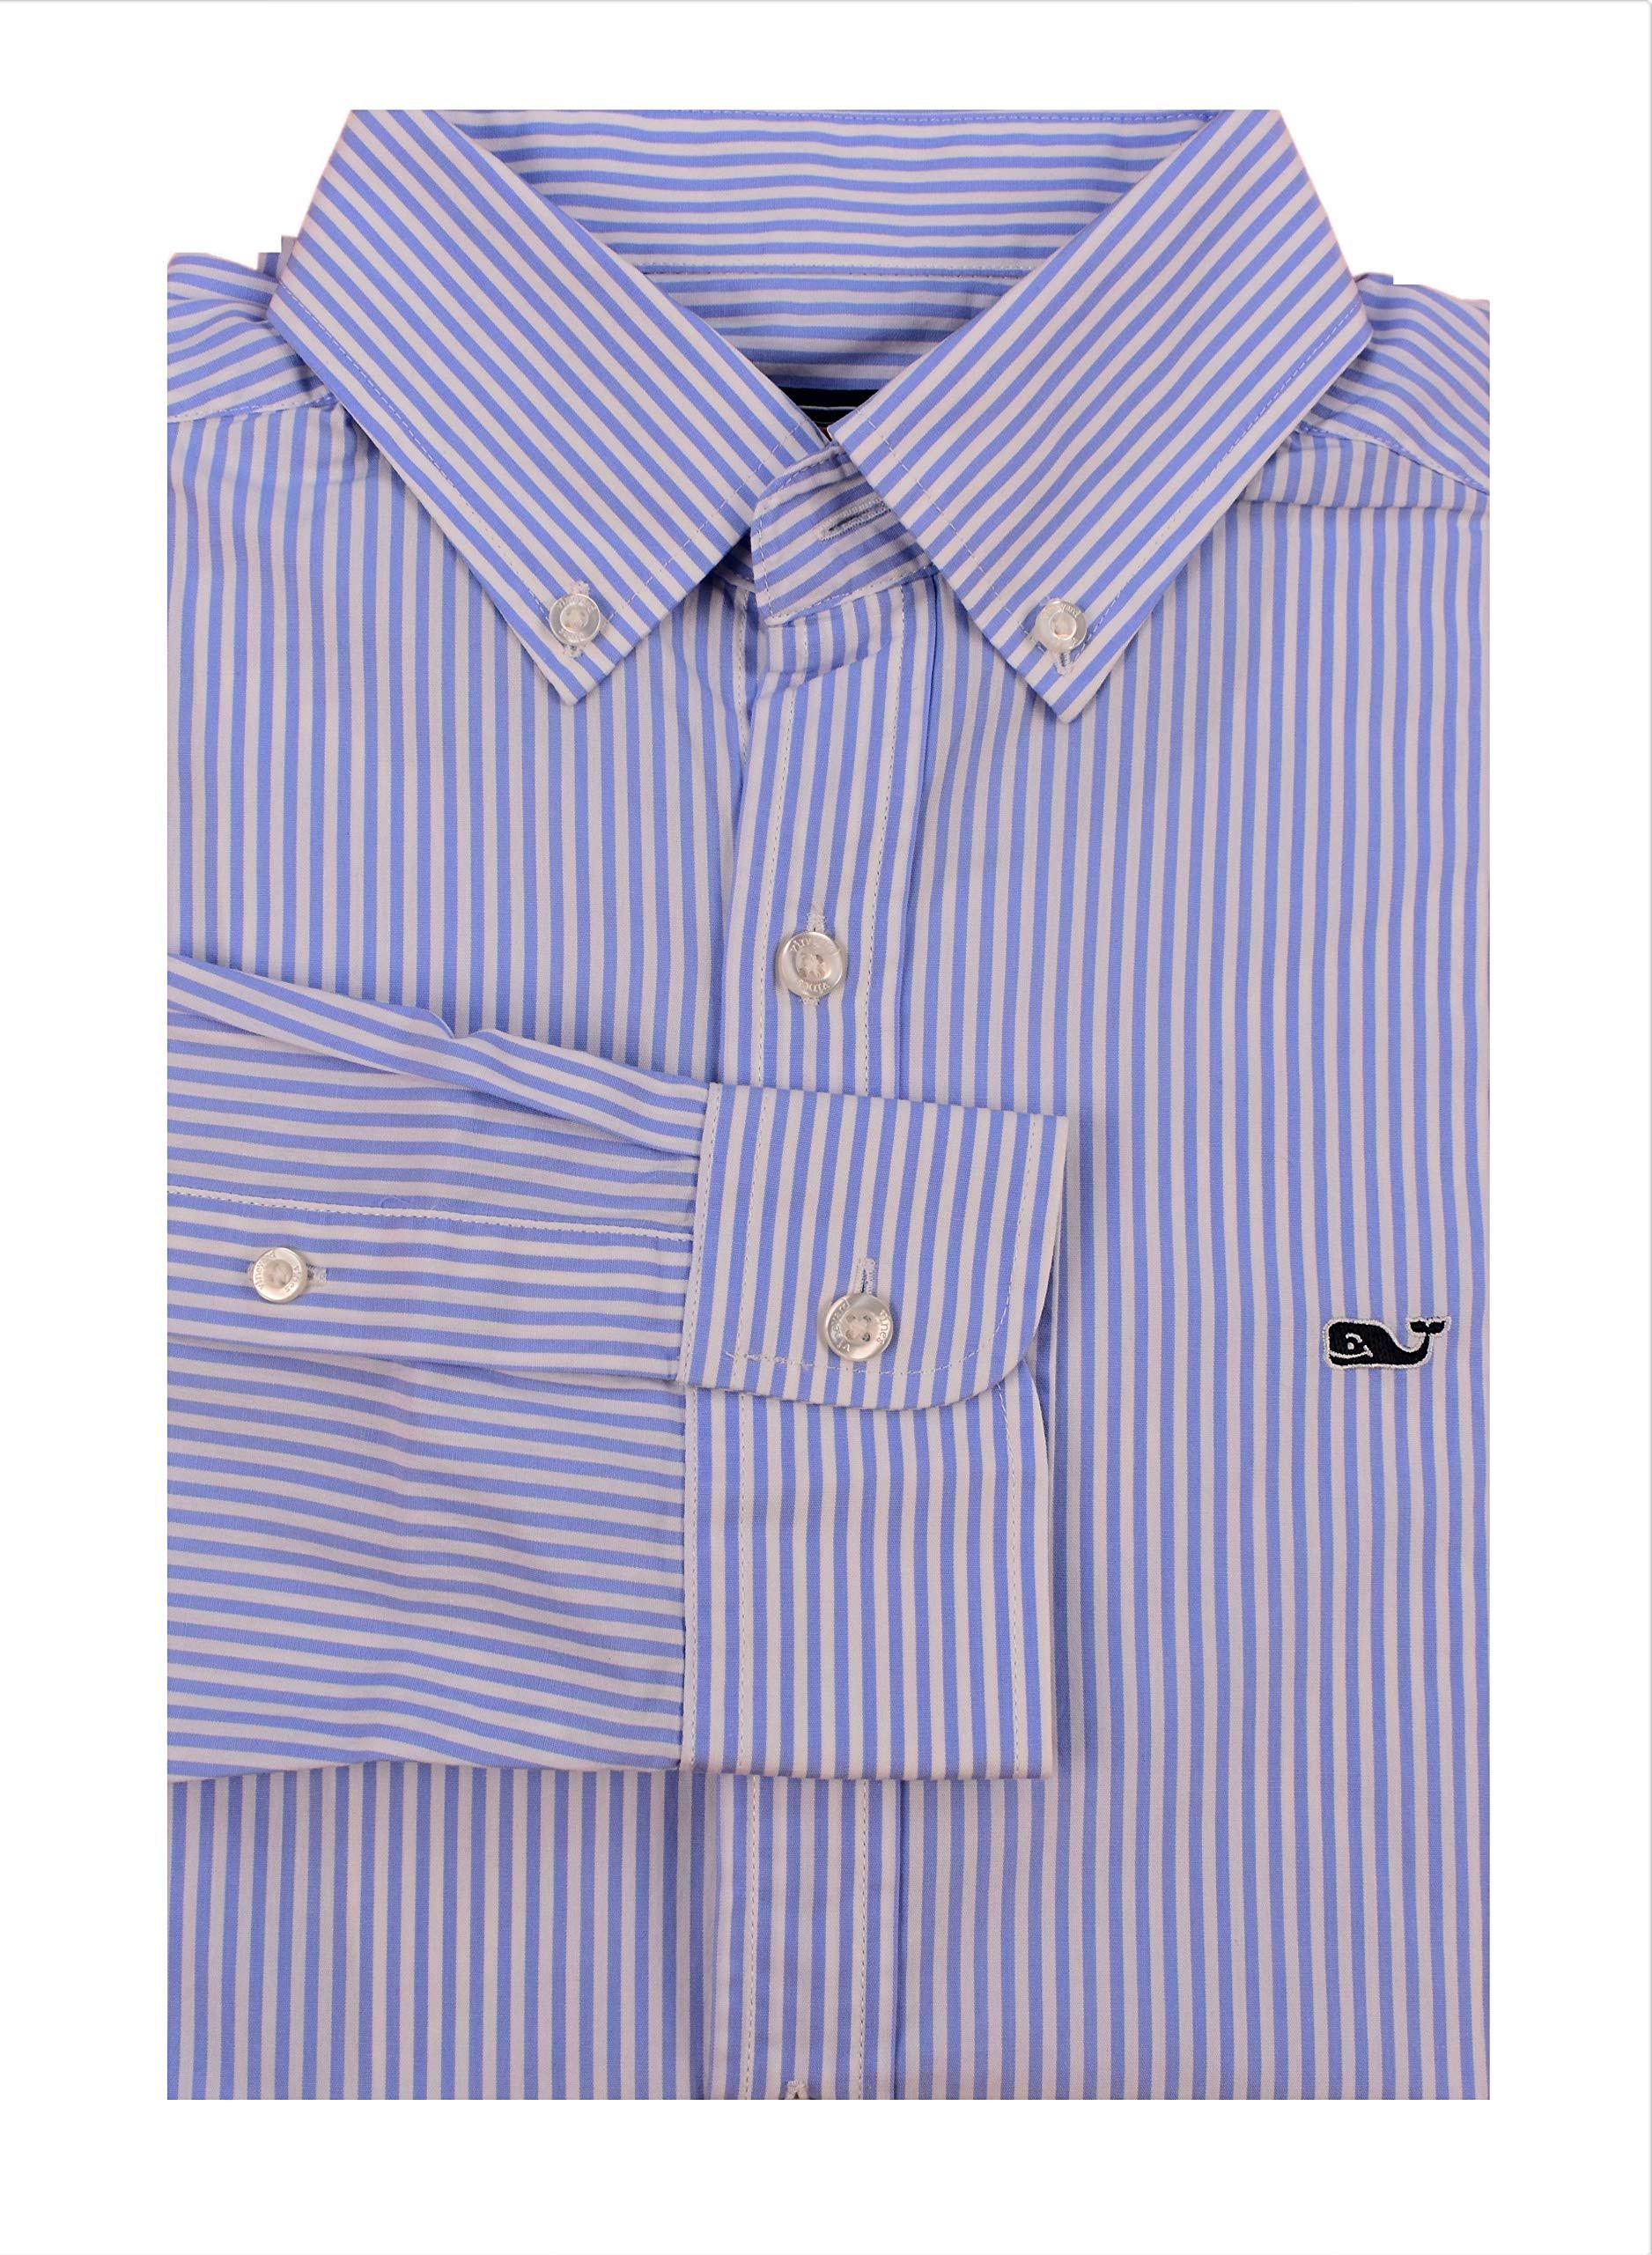 Camiseta Vines Vineyard Clásica En Ballena Forma De Hombres T6EUwq